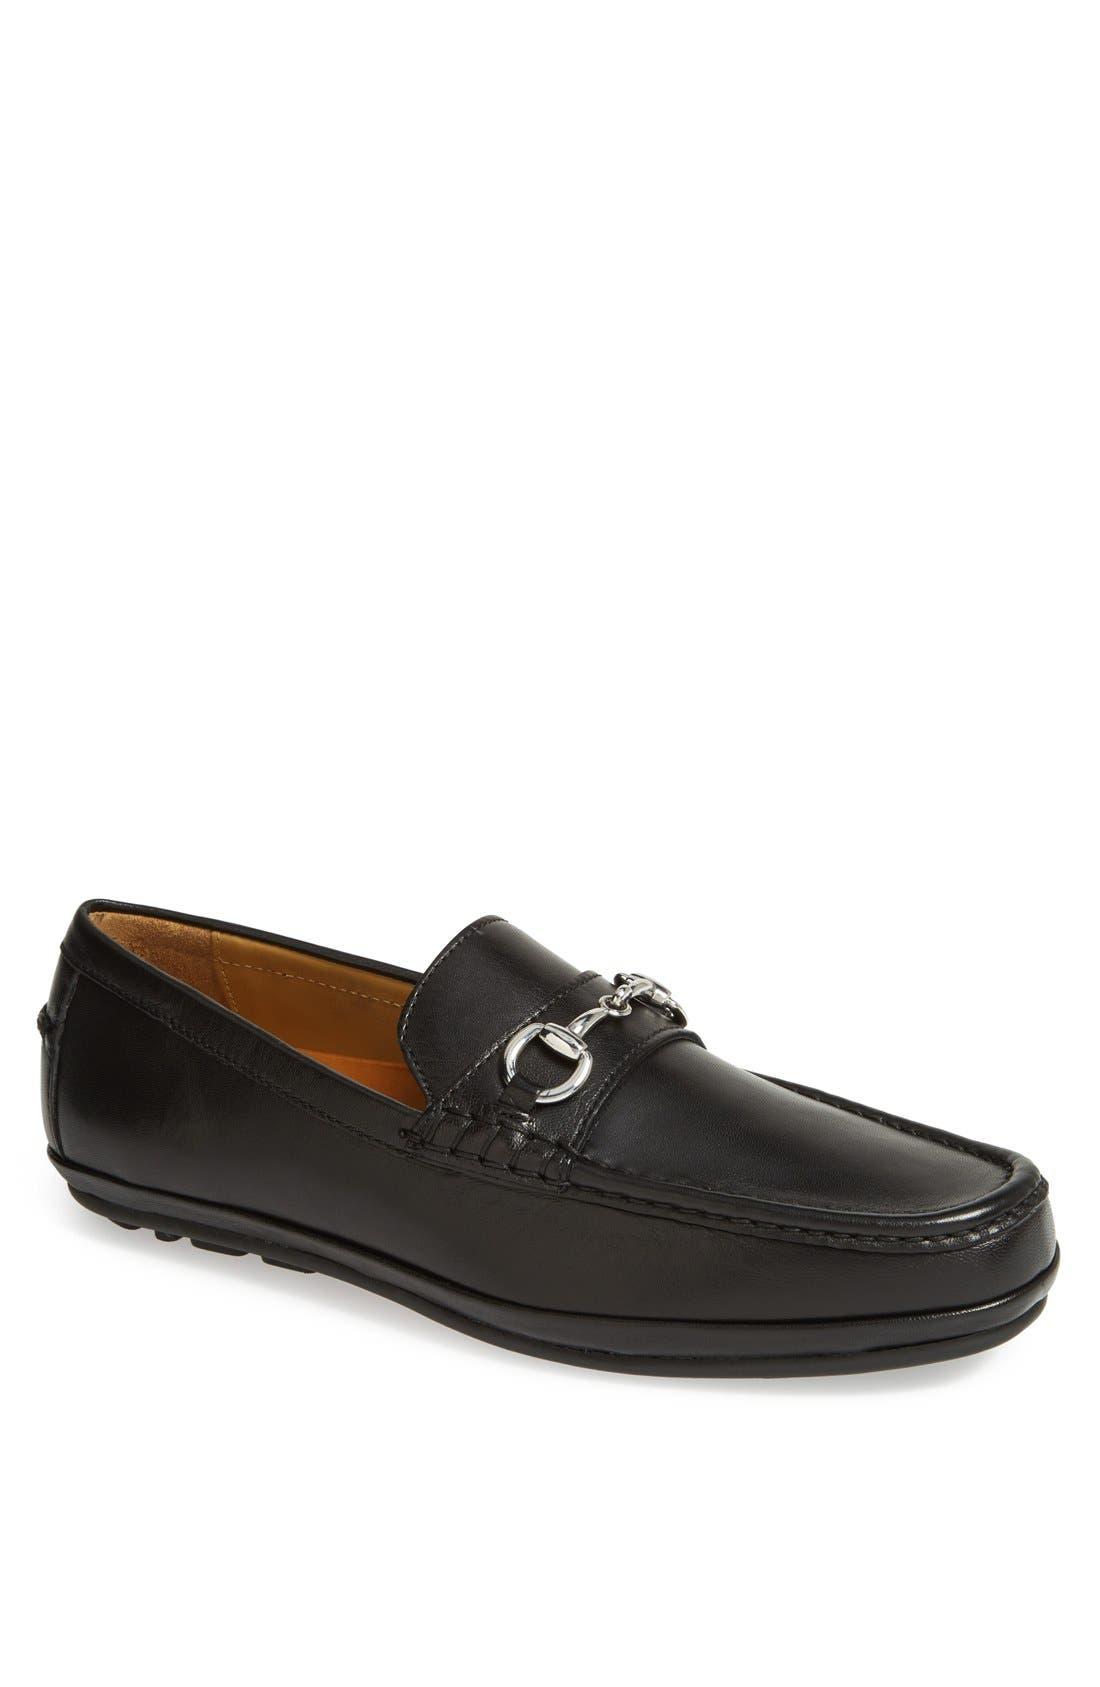 Main Image - Cole Haan 'Hudson' Driving Shoe (Men)